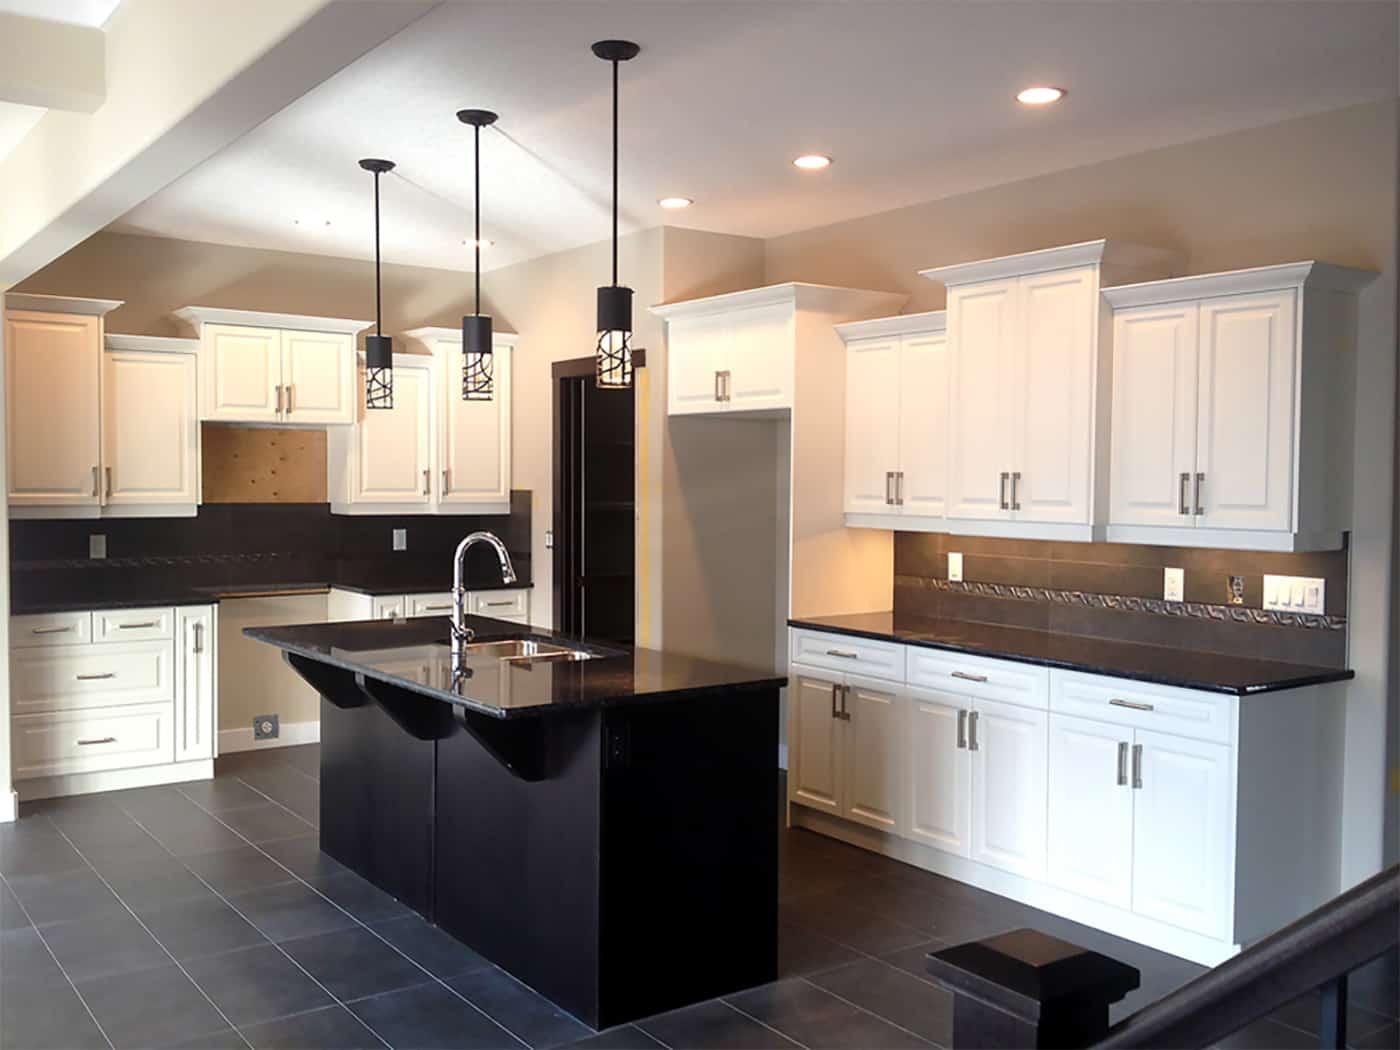 Woodworx Cabinet Builders Inc. | Custom Cabinets Edmonton, AB